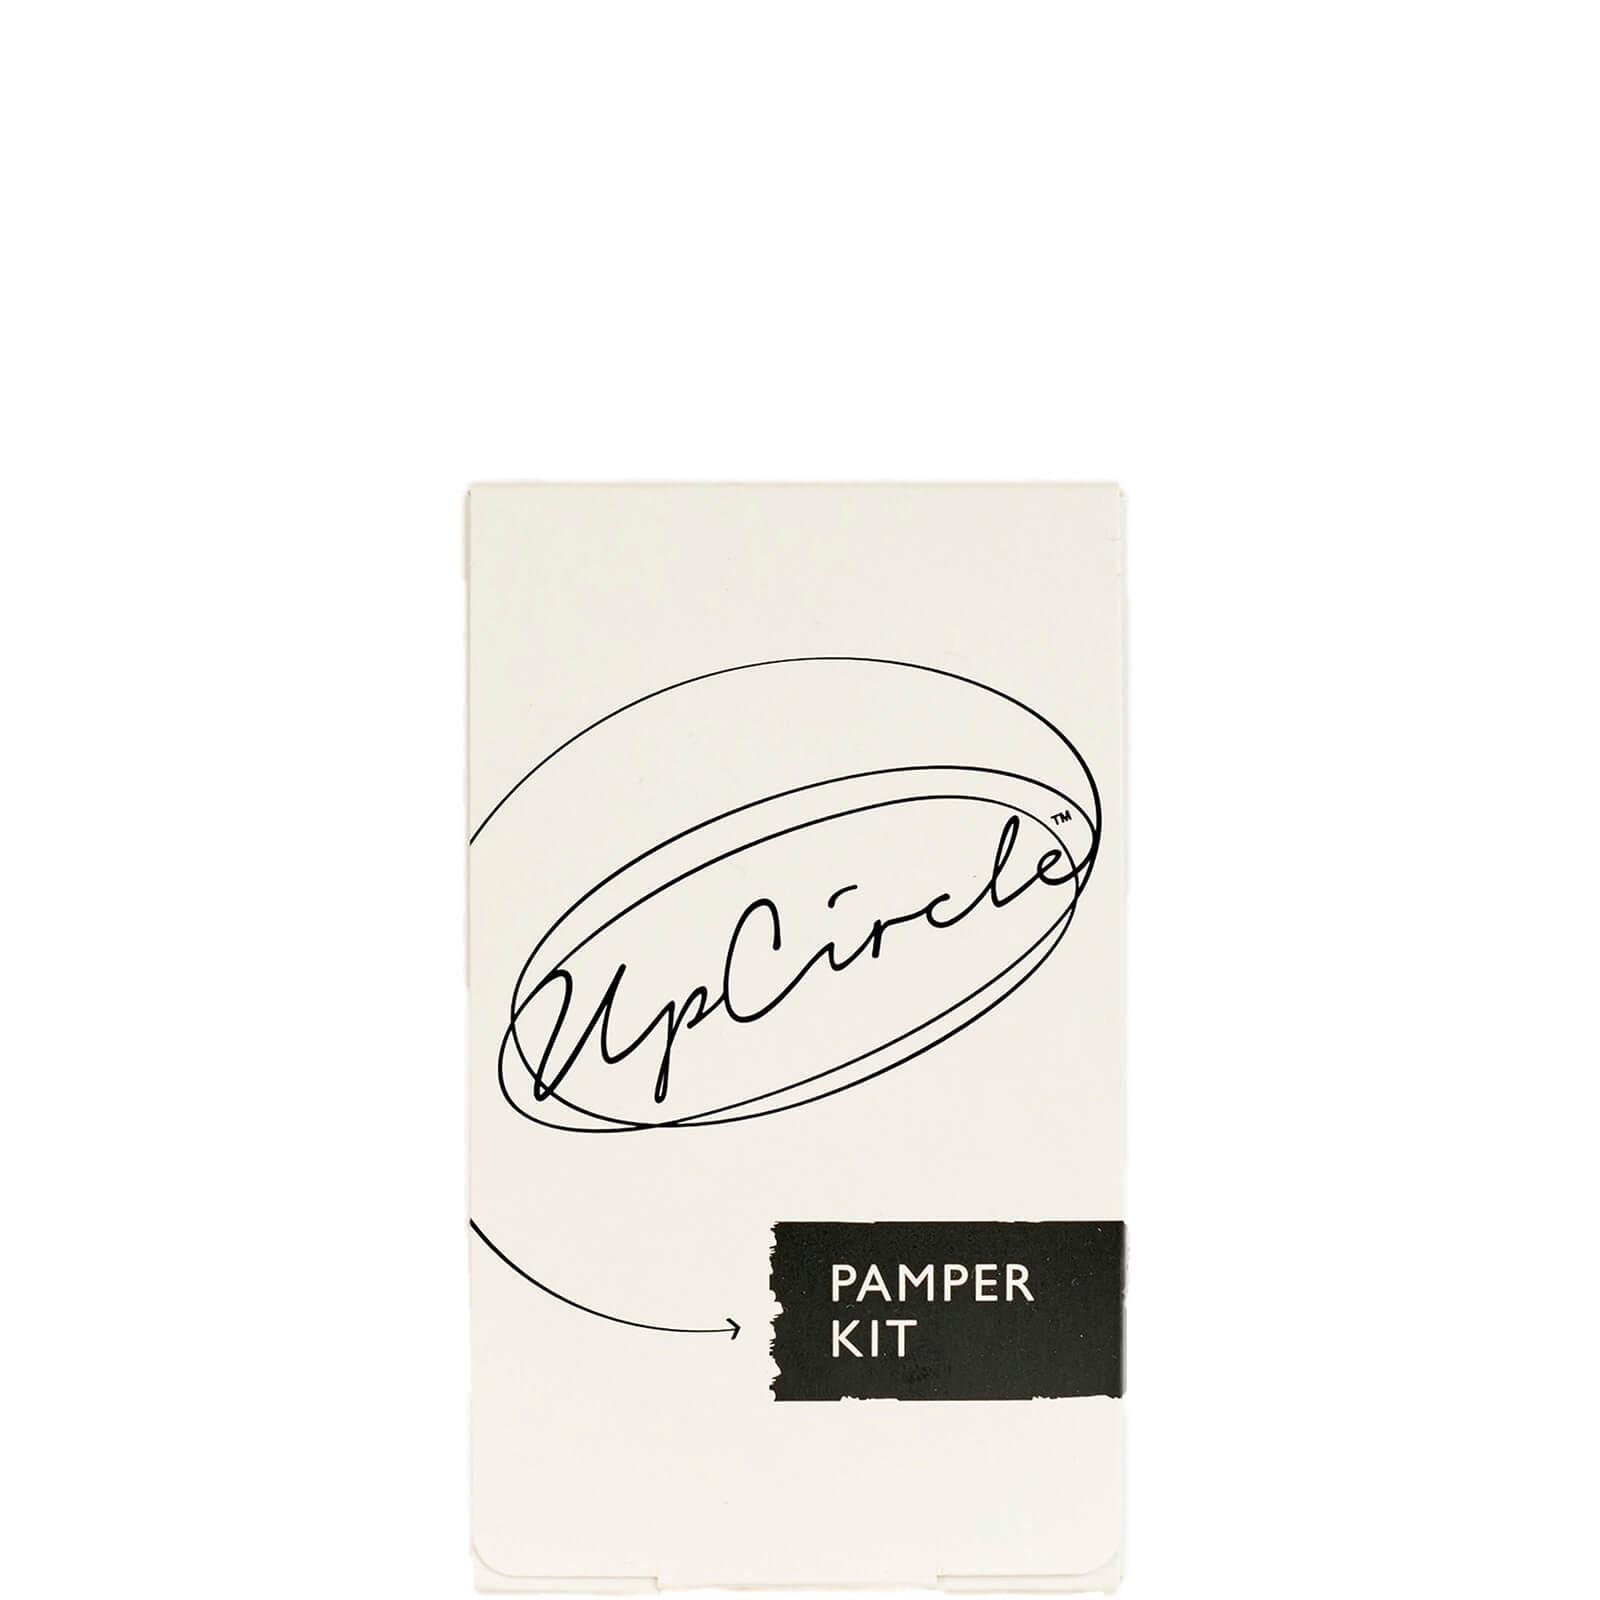 Up Circle Beauty The Pamper Kit